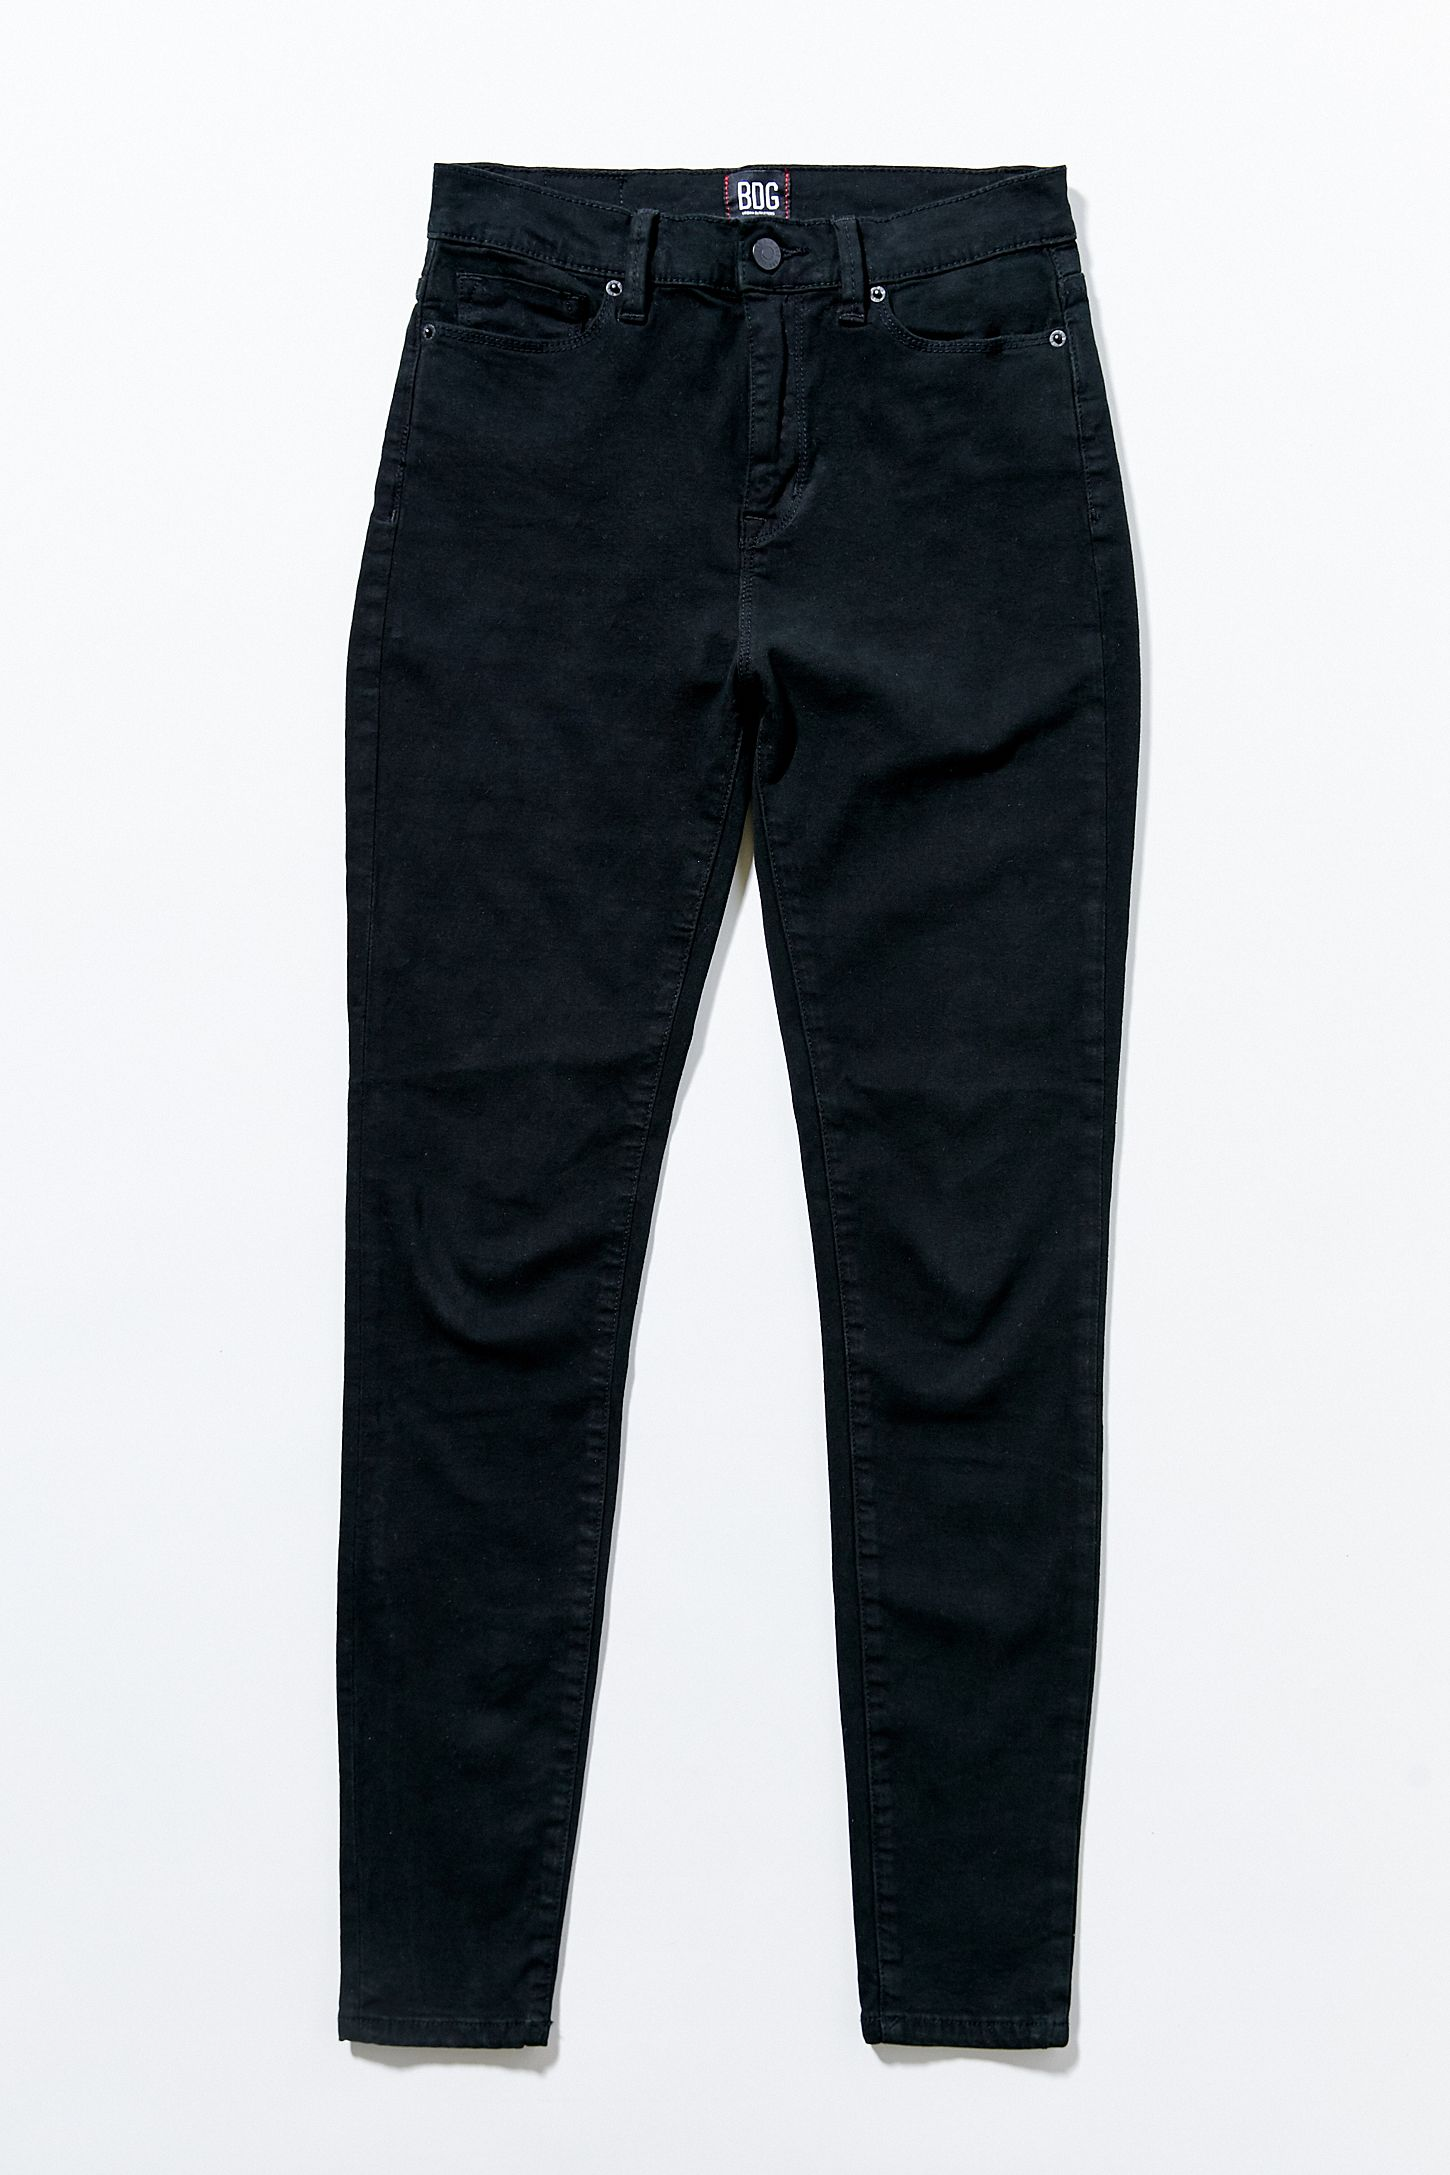 de747c4dba BDG Twig High-Rise Skinny Jean - Black | Urban Outfitters